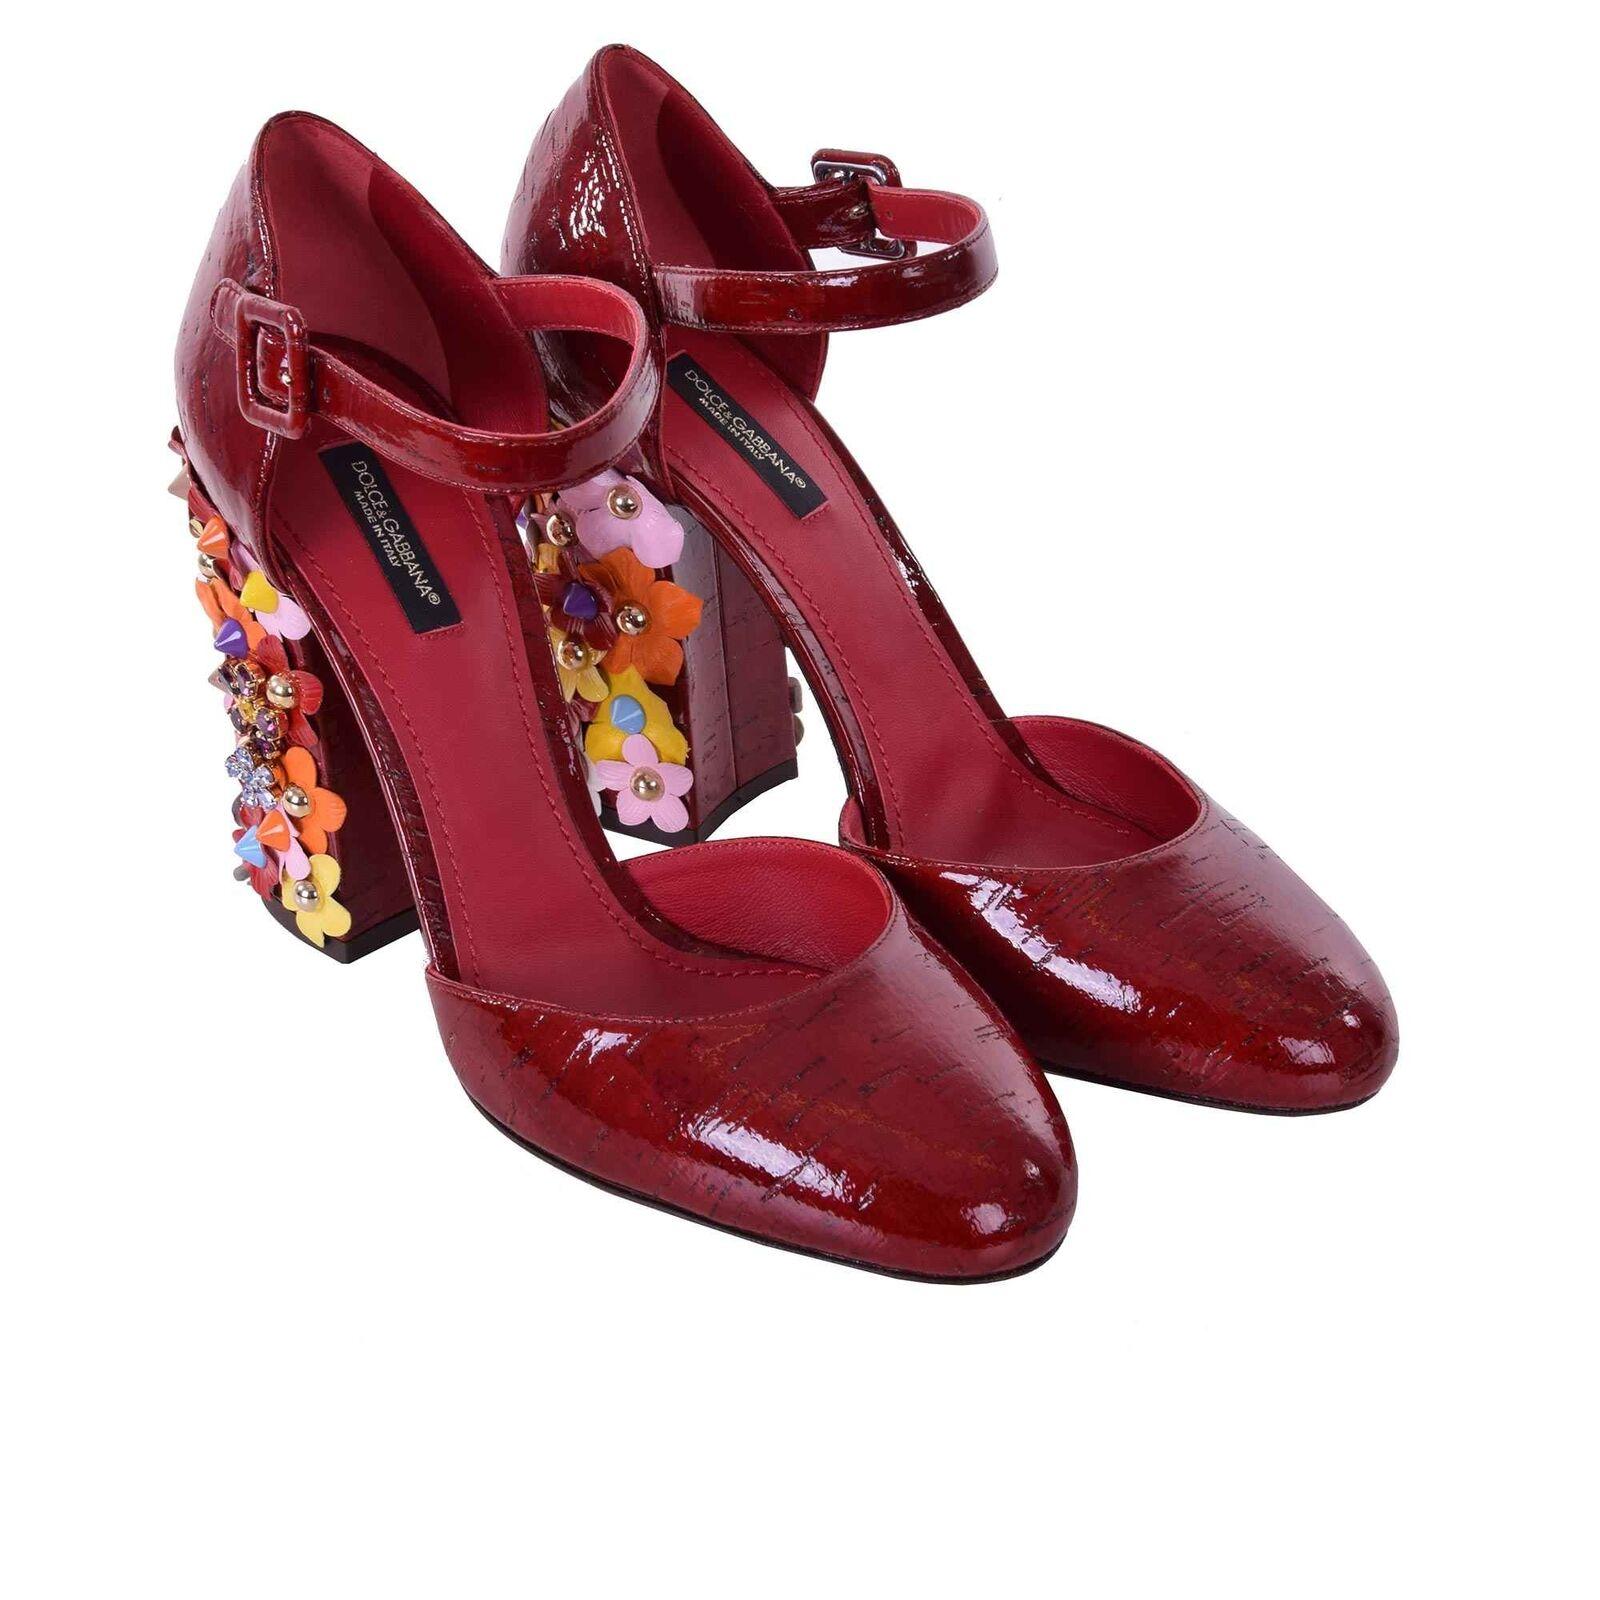 ddd34c08c5c694 Dolce Sughero Pumps amp  Gabbana Vally Scarpe Cristalli Con rwBrqdx